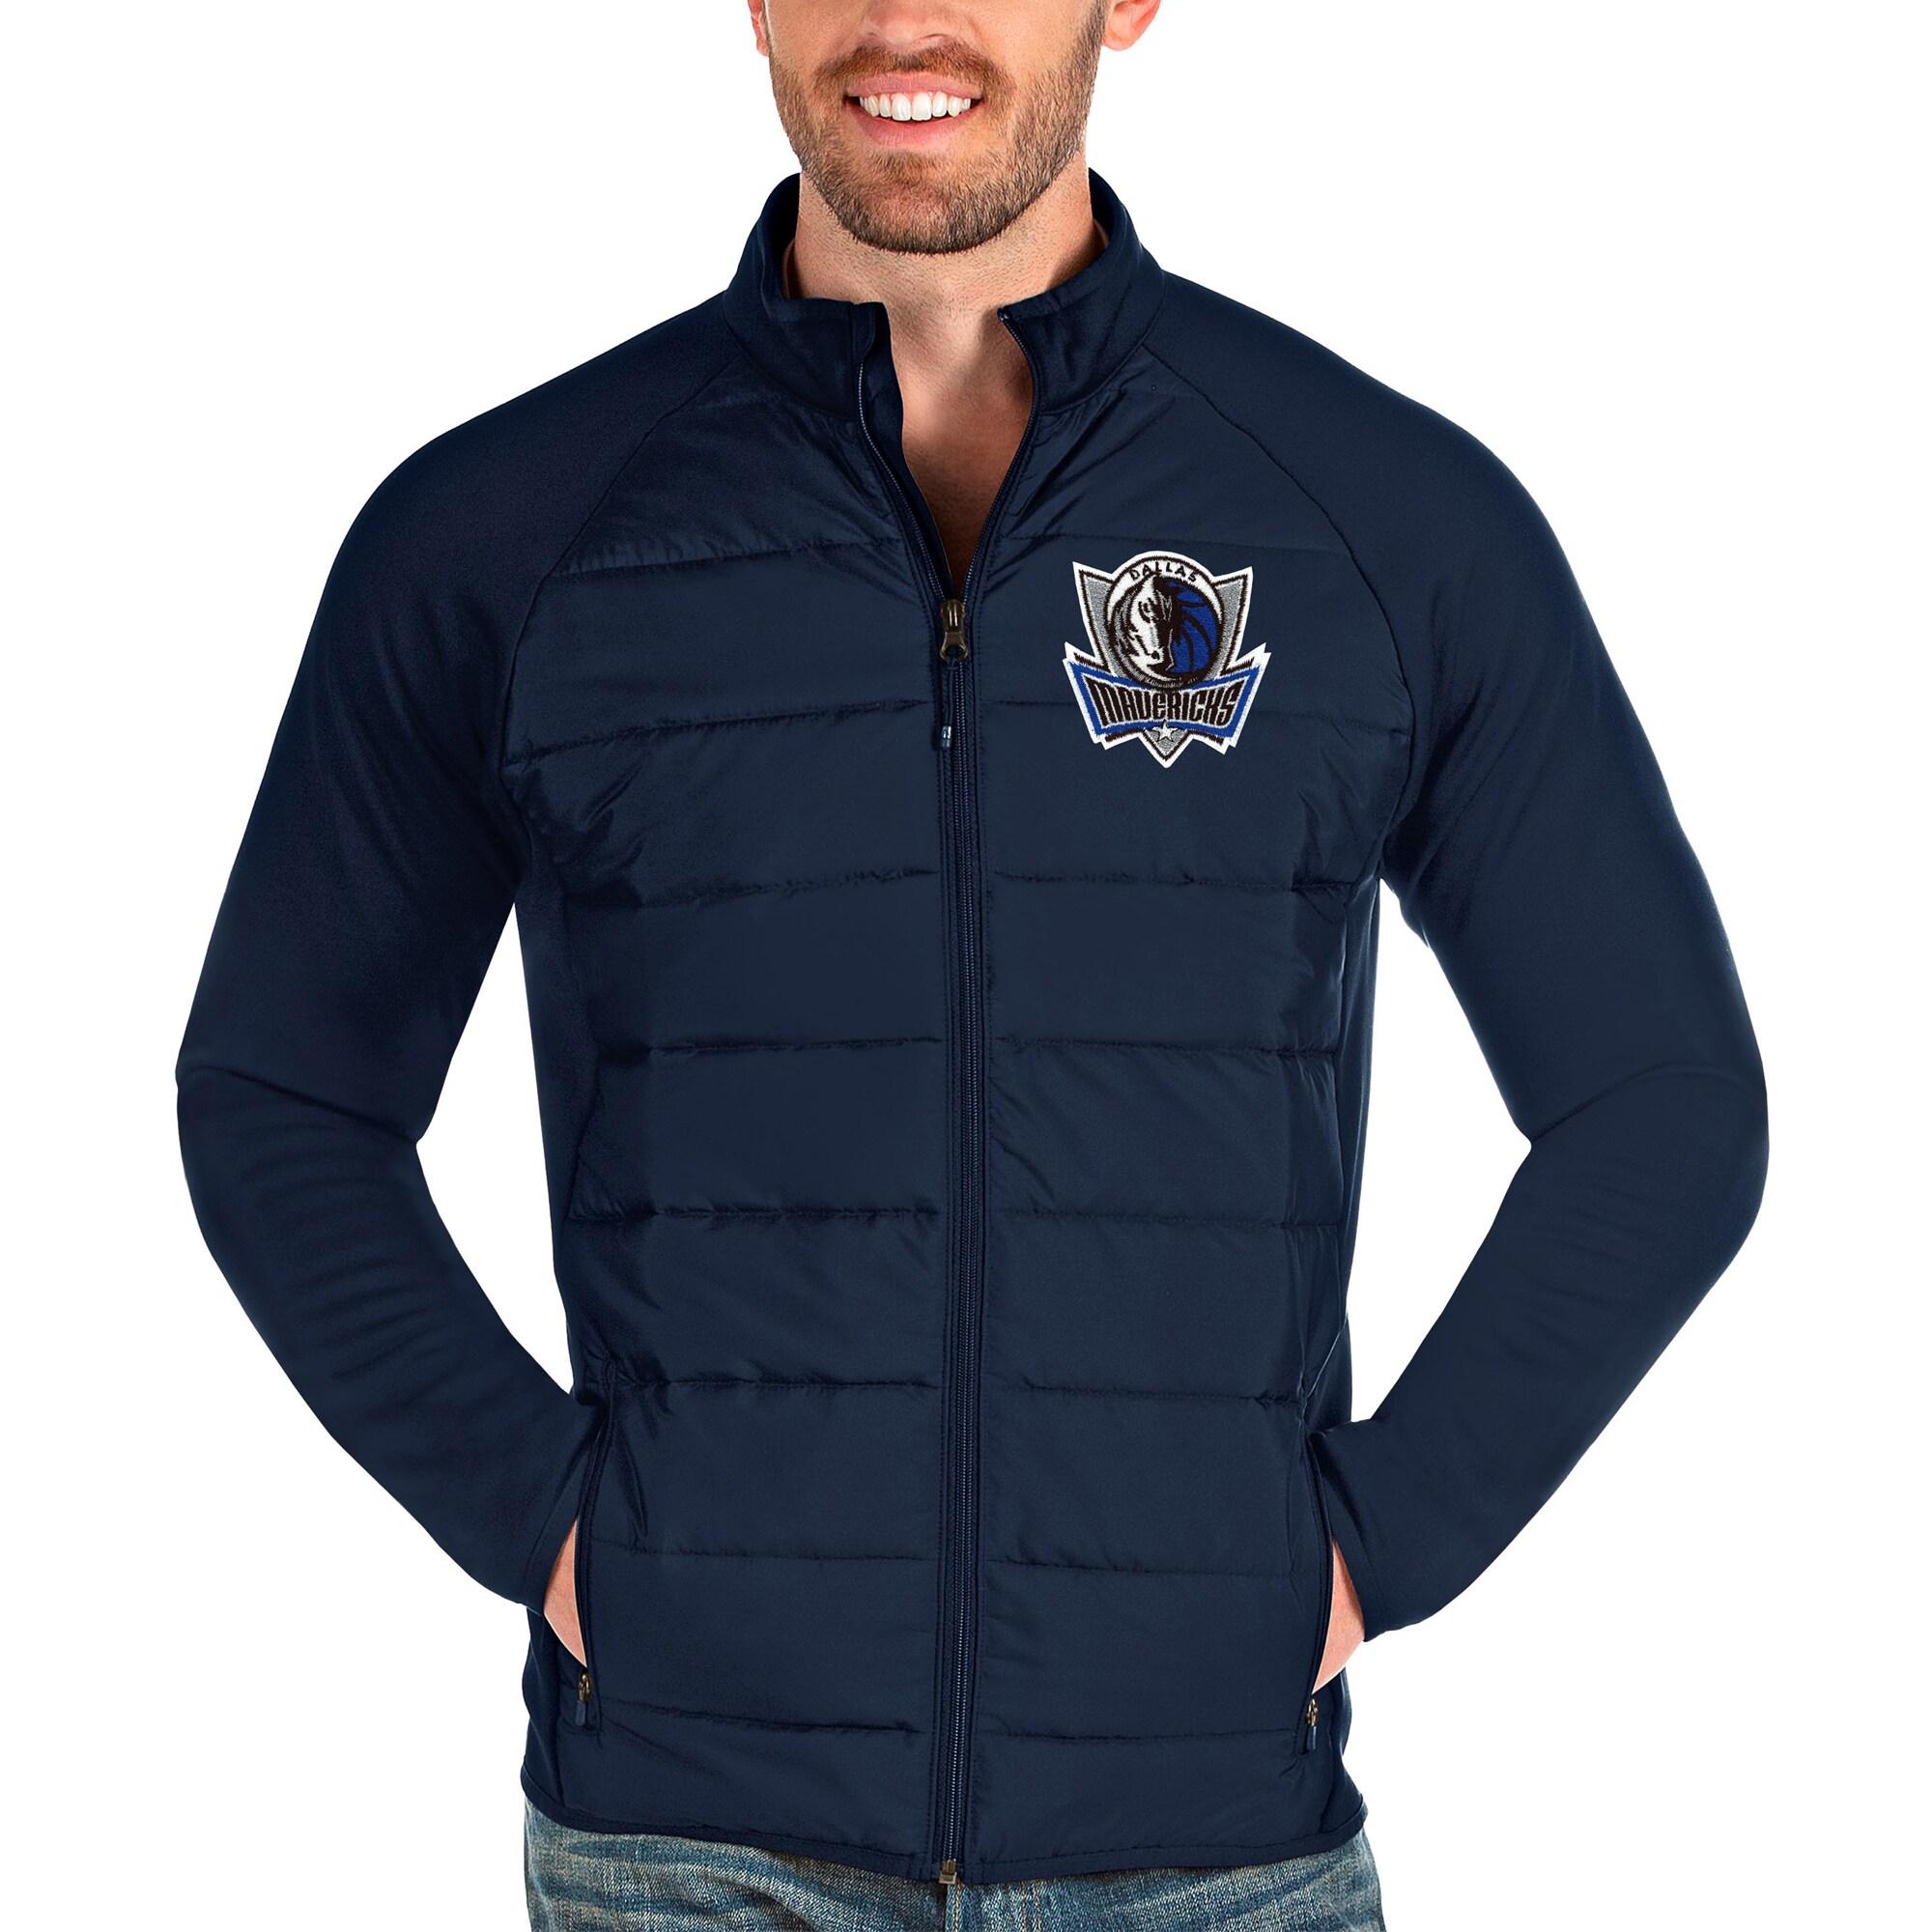 Dallas Mavericks Antigua Altitude Full-Zip Jacket - Navy